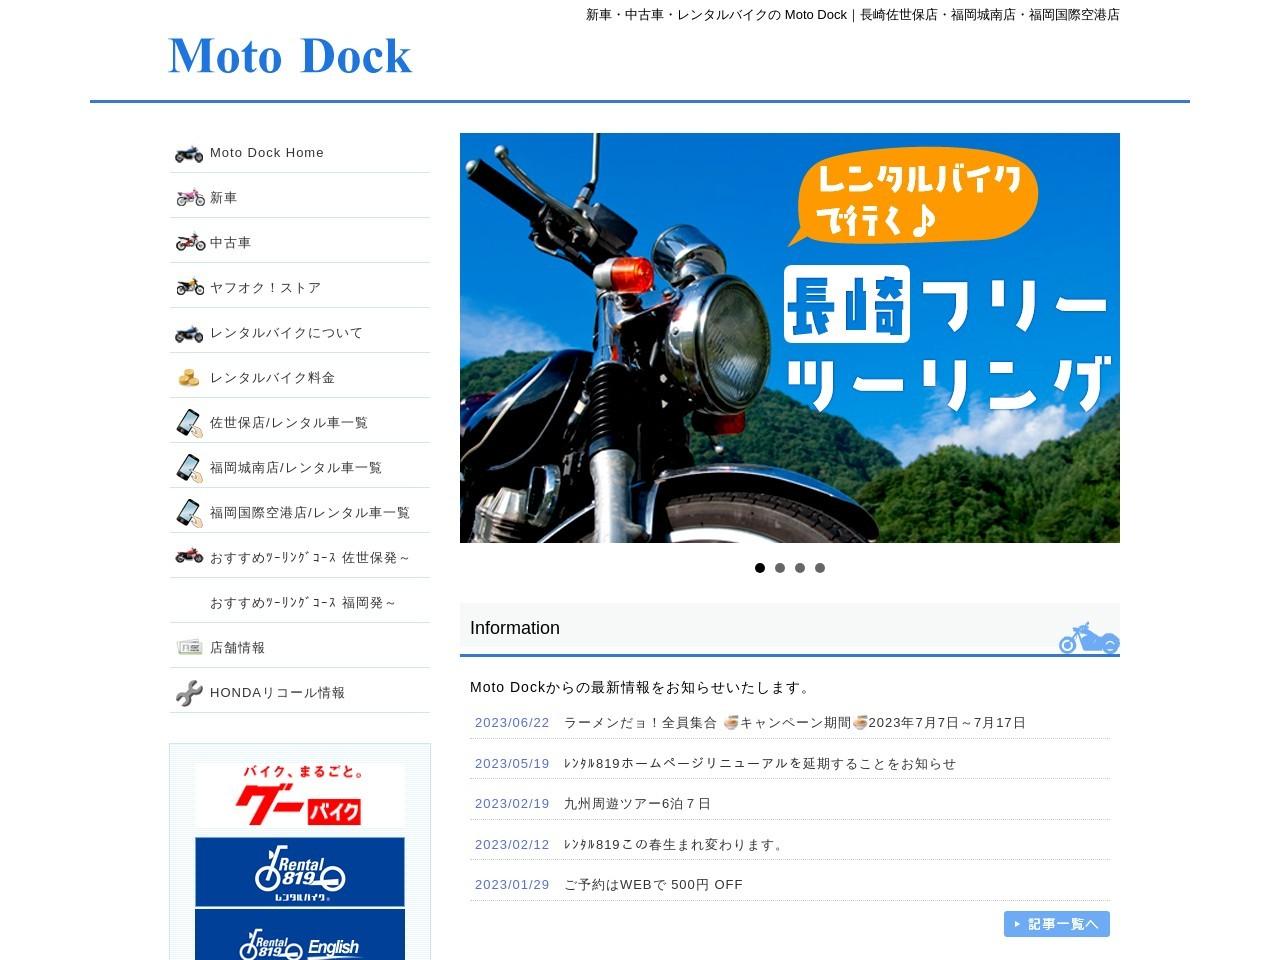 MotoDock福岡店